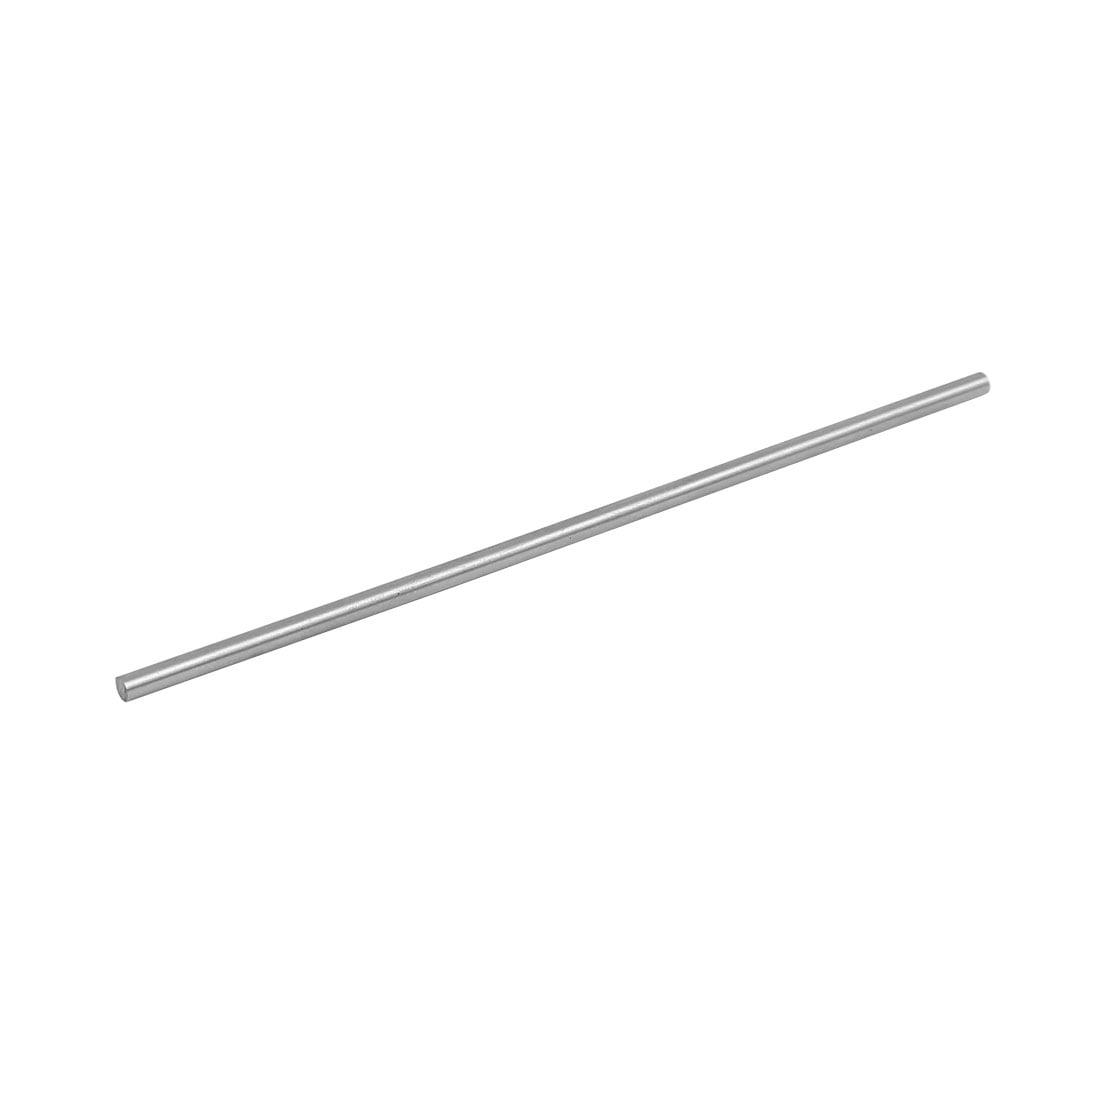 2.5mm Dia 100mm Length HSS Round Shaft Rod Bar Lathe Tools Gray by